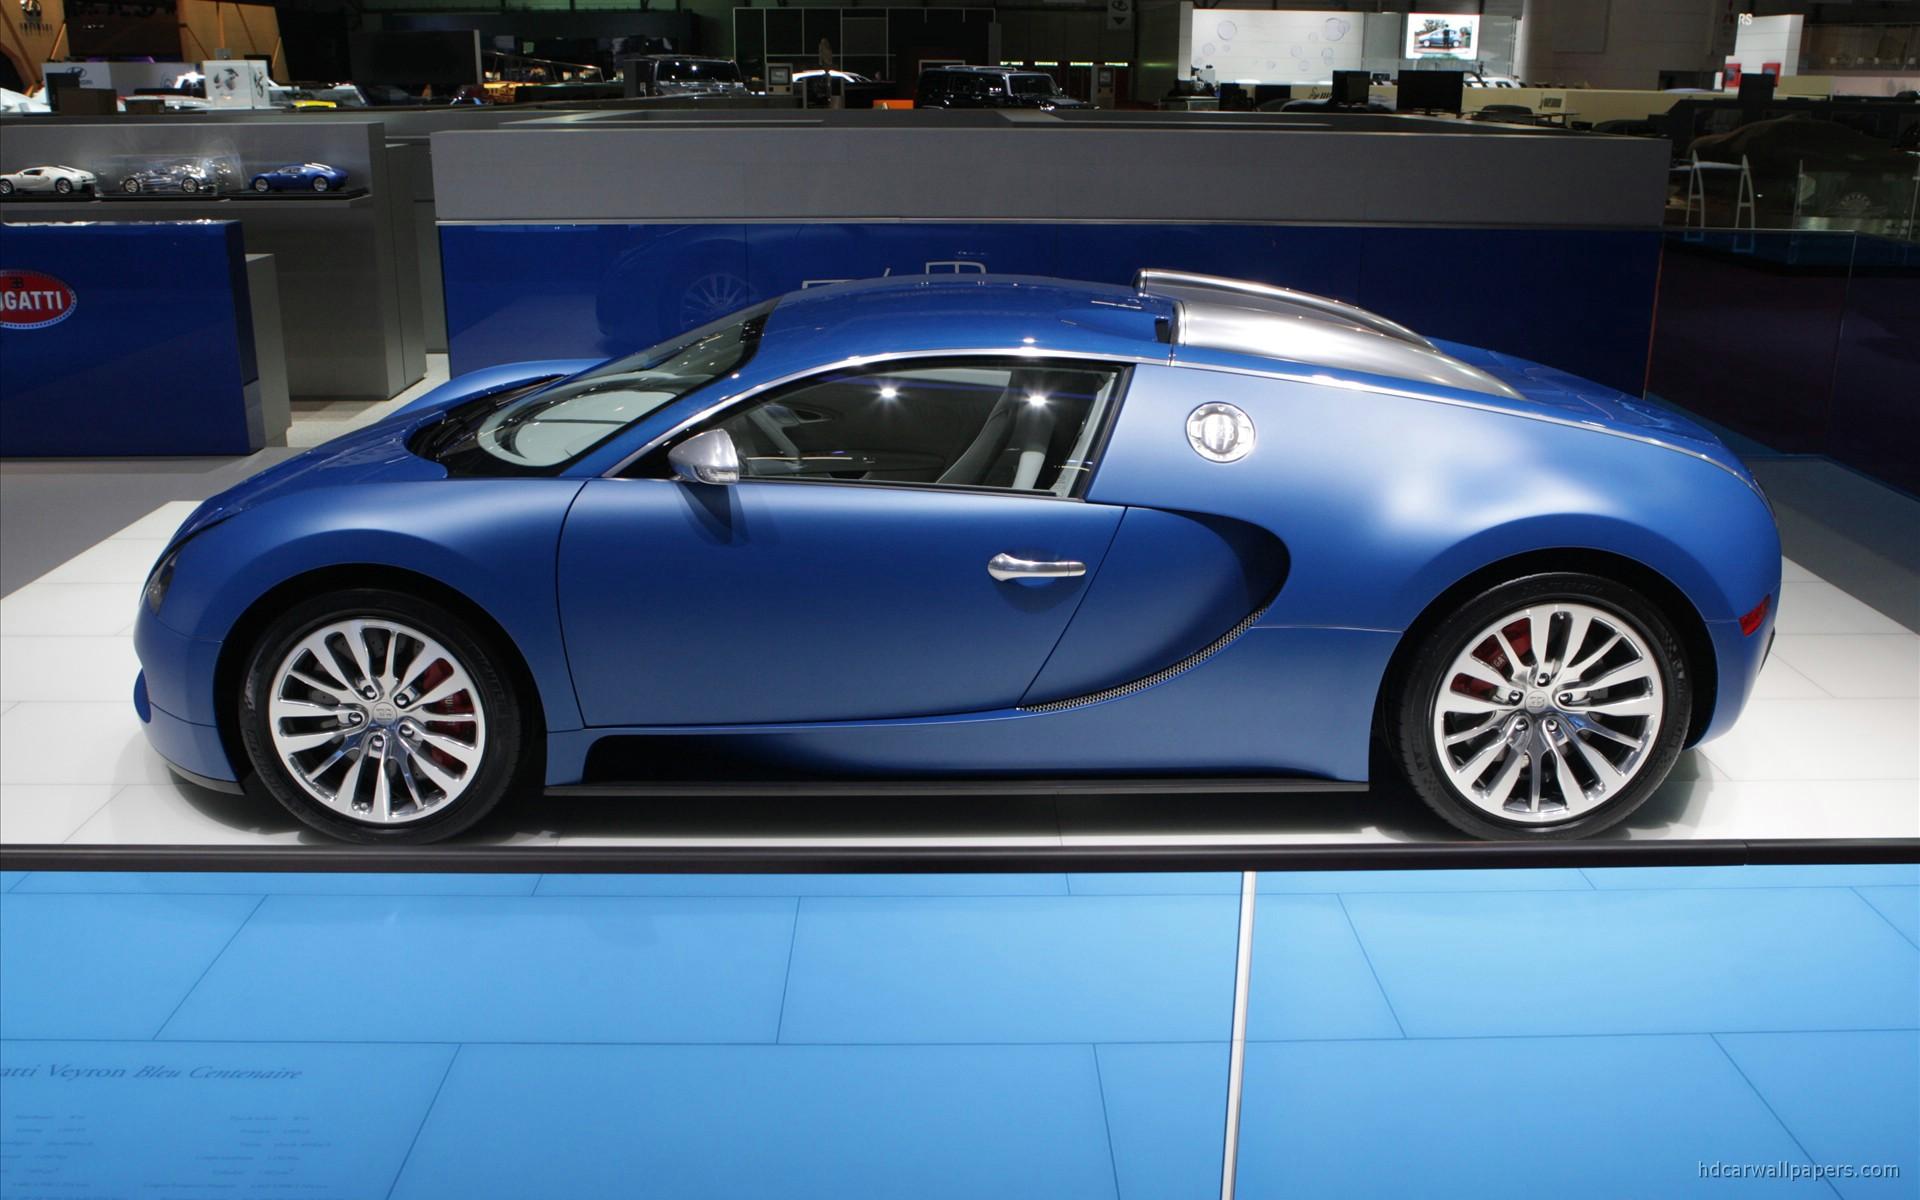 bugatti_veyron_bleu_centenaire-wide Stunning Bugatti Veyron Price In Brazil Cars Trend